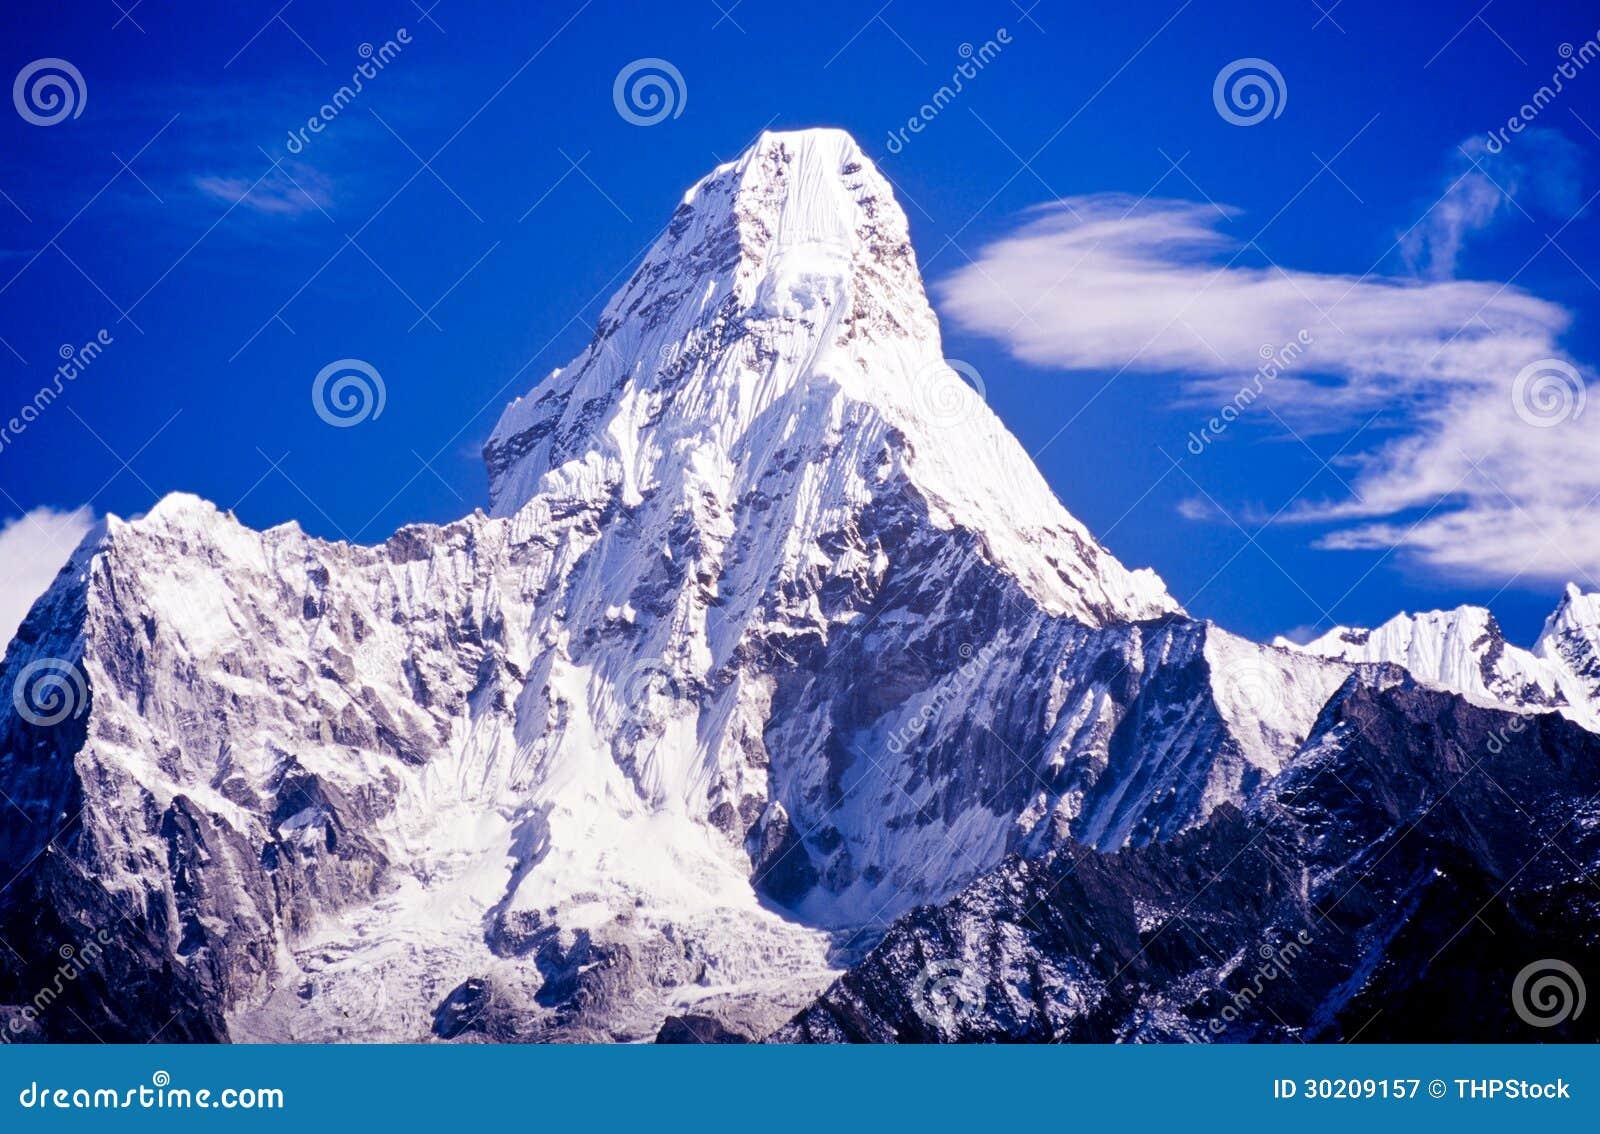 Ama Dablam Nepal Himalaya Royalty Free Stock Photography Image 30209157